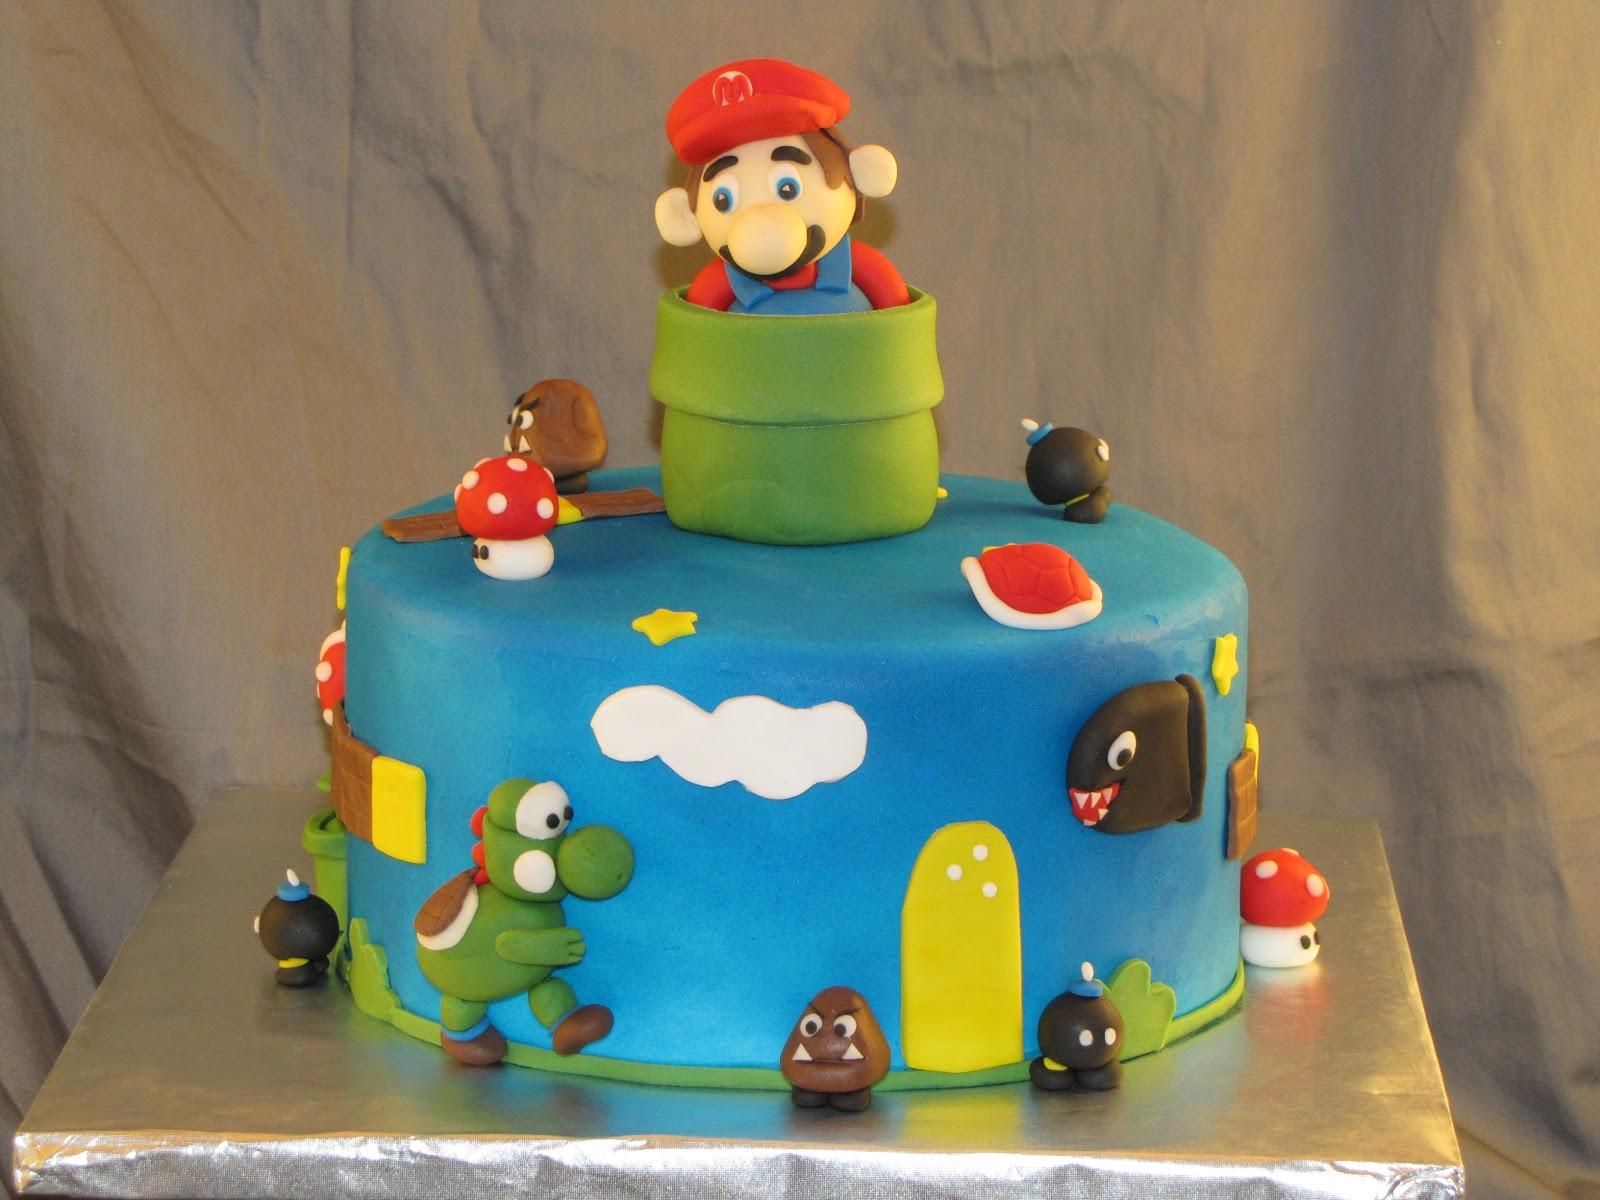 How To Make Super Mario Cake Decorations